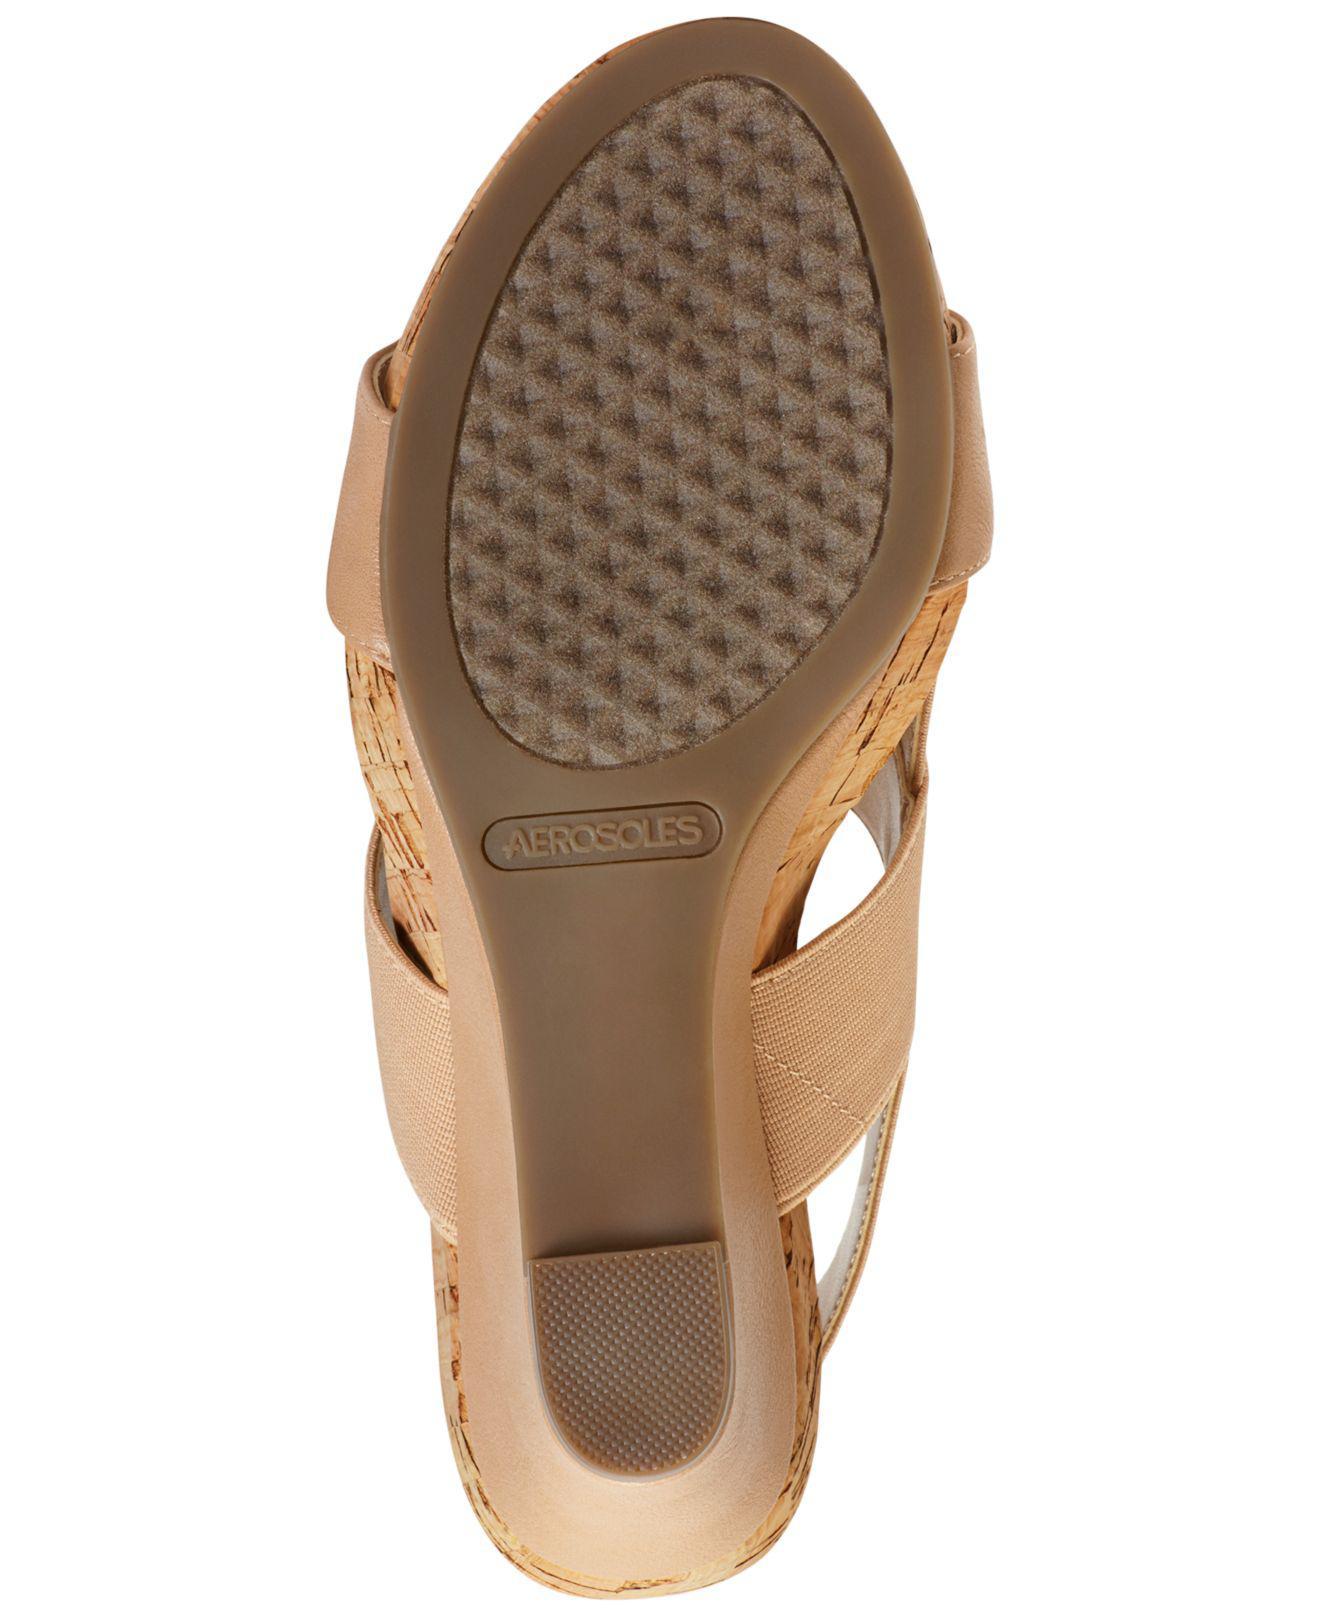 42fb5f8bdb2 Lyst - Aerosoles Magnolia Plush Slingback Sandal in Brown